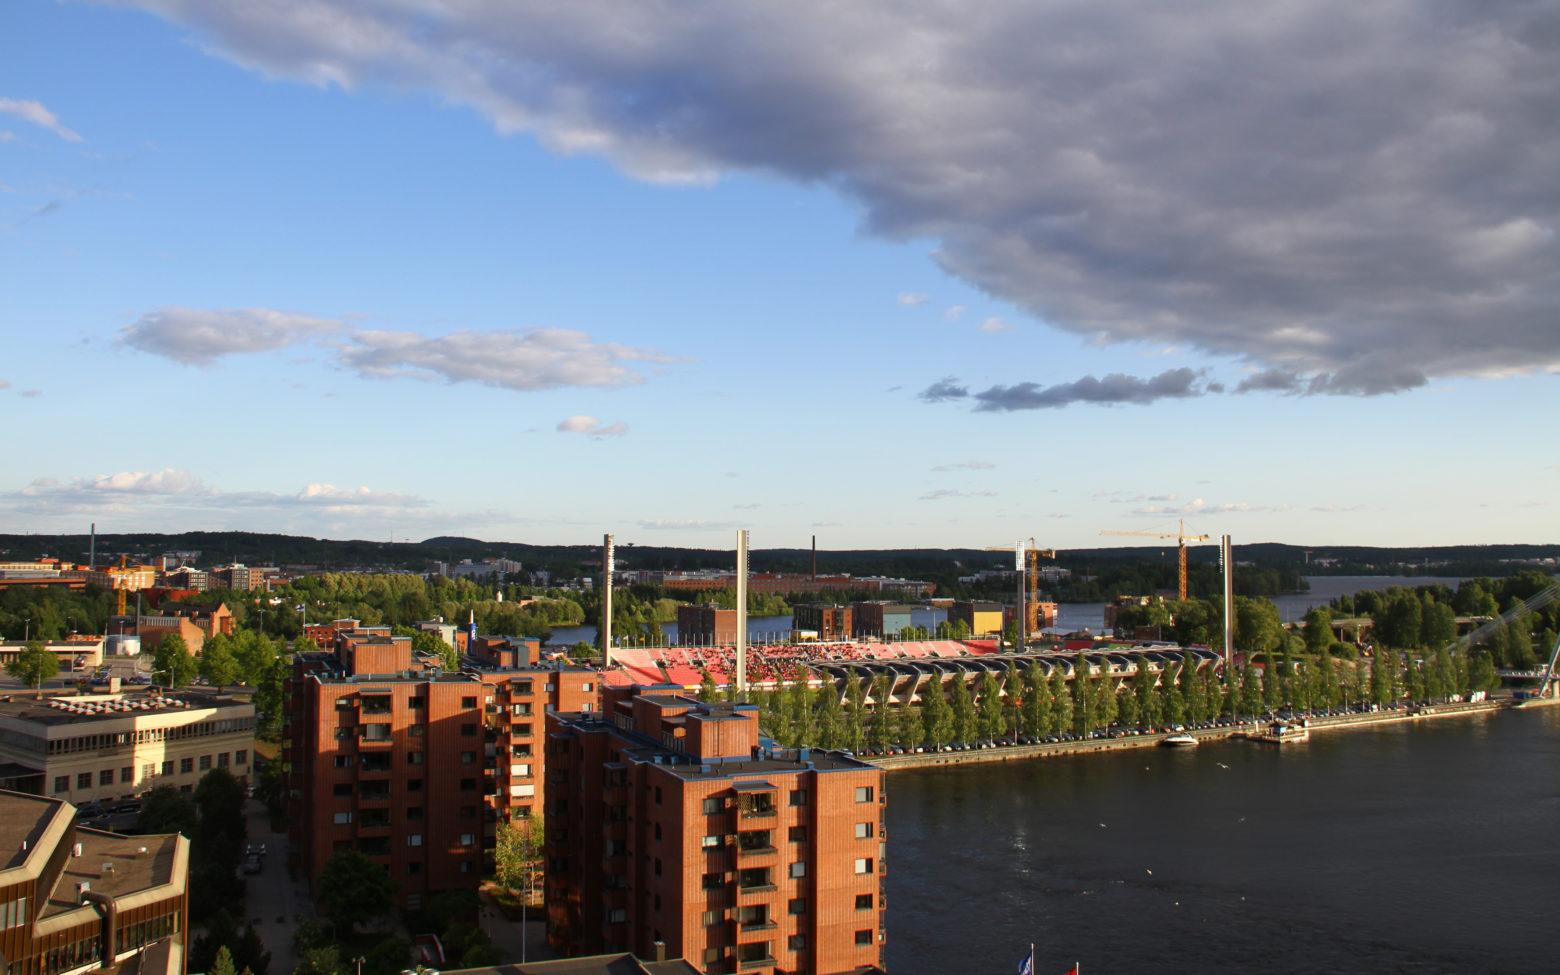 Ratinan stadion Tampereella